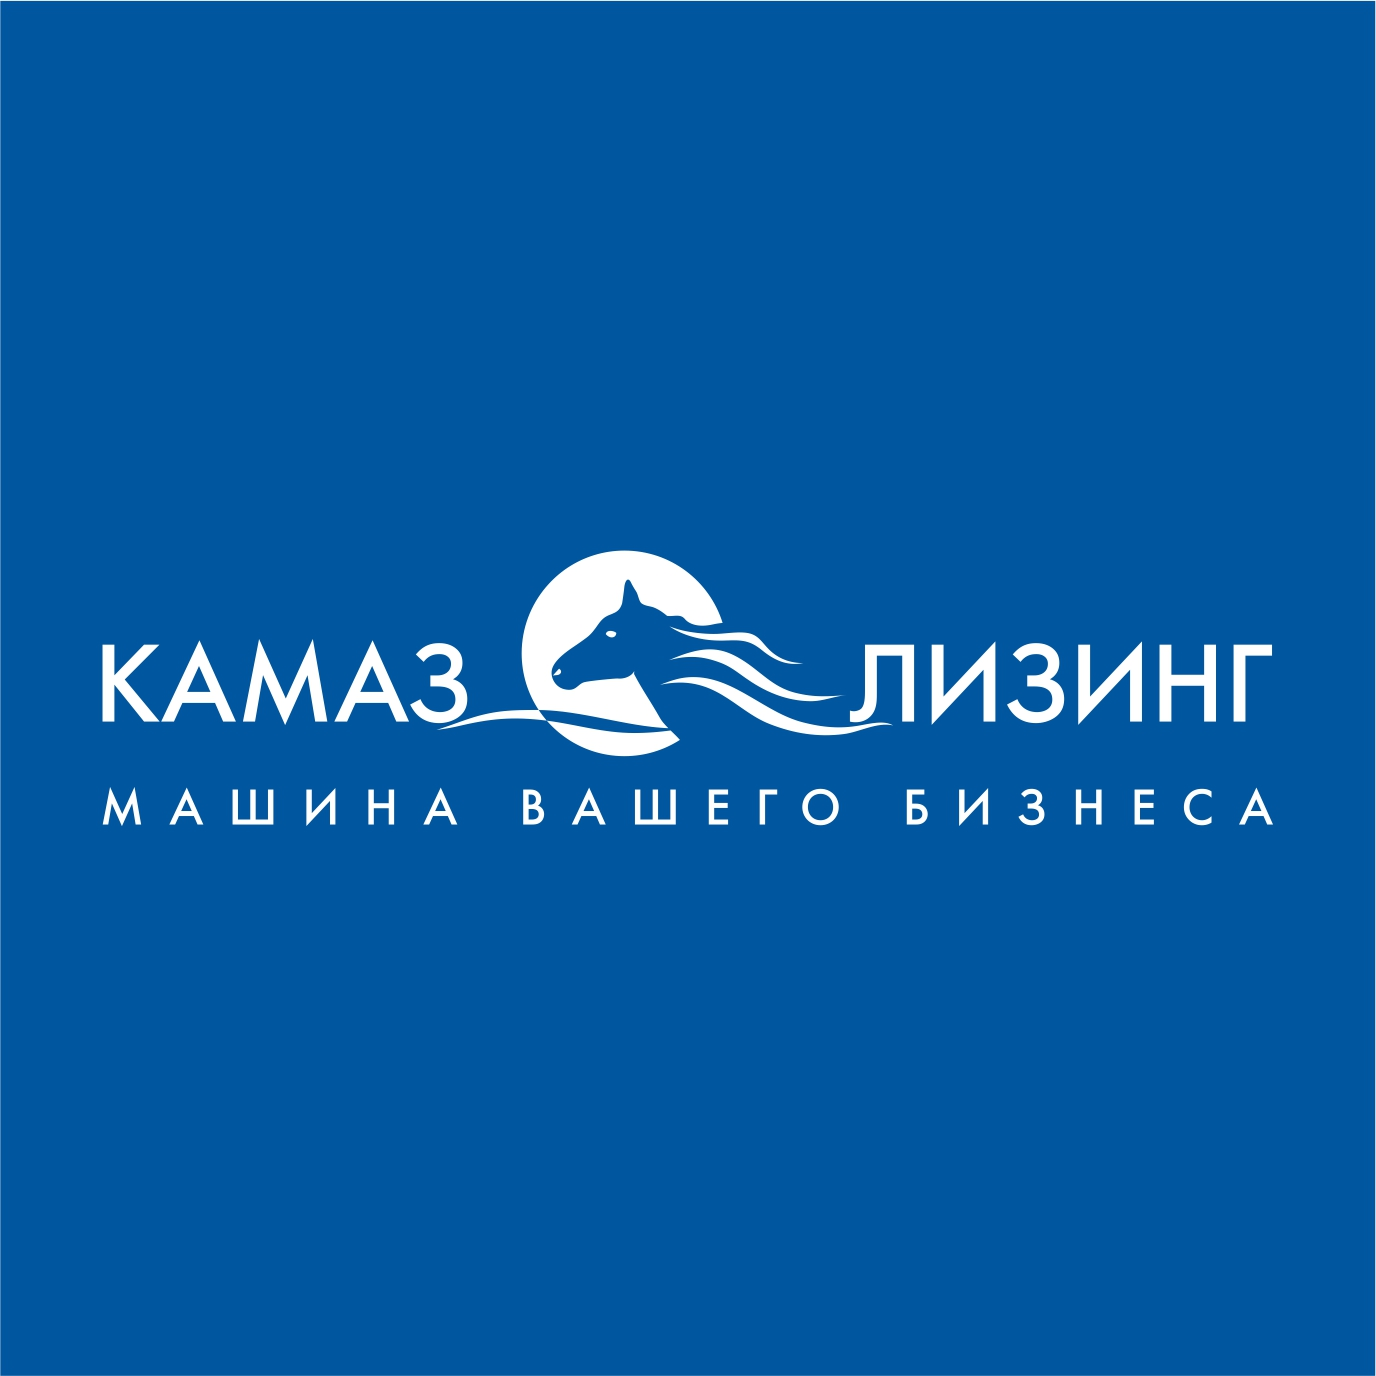 «КАМАЗ-ЛИЗИНГ» ПОДВЁЛ ИТОГИ ГОДА